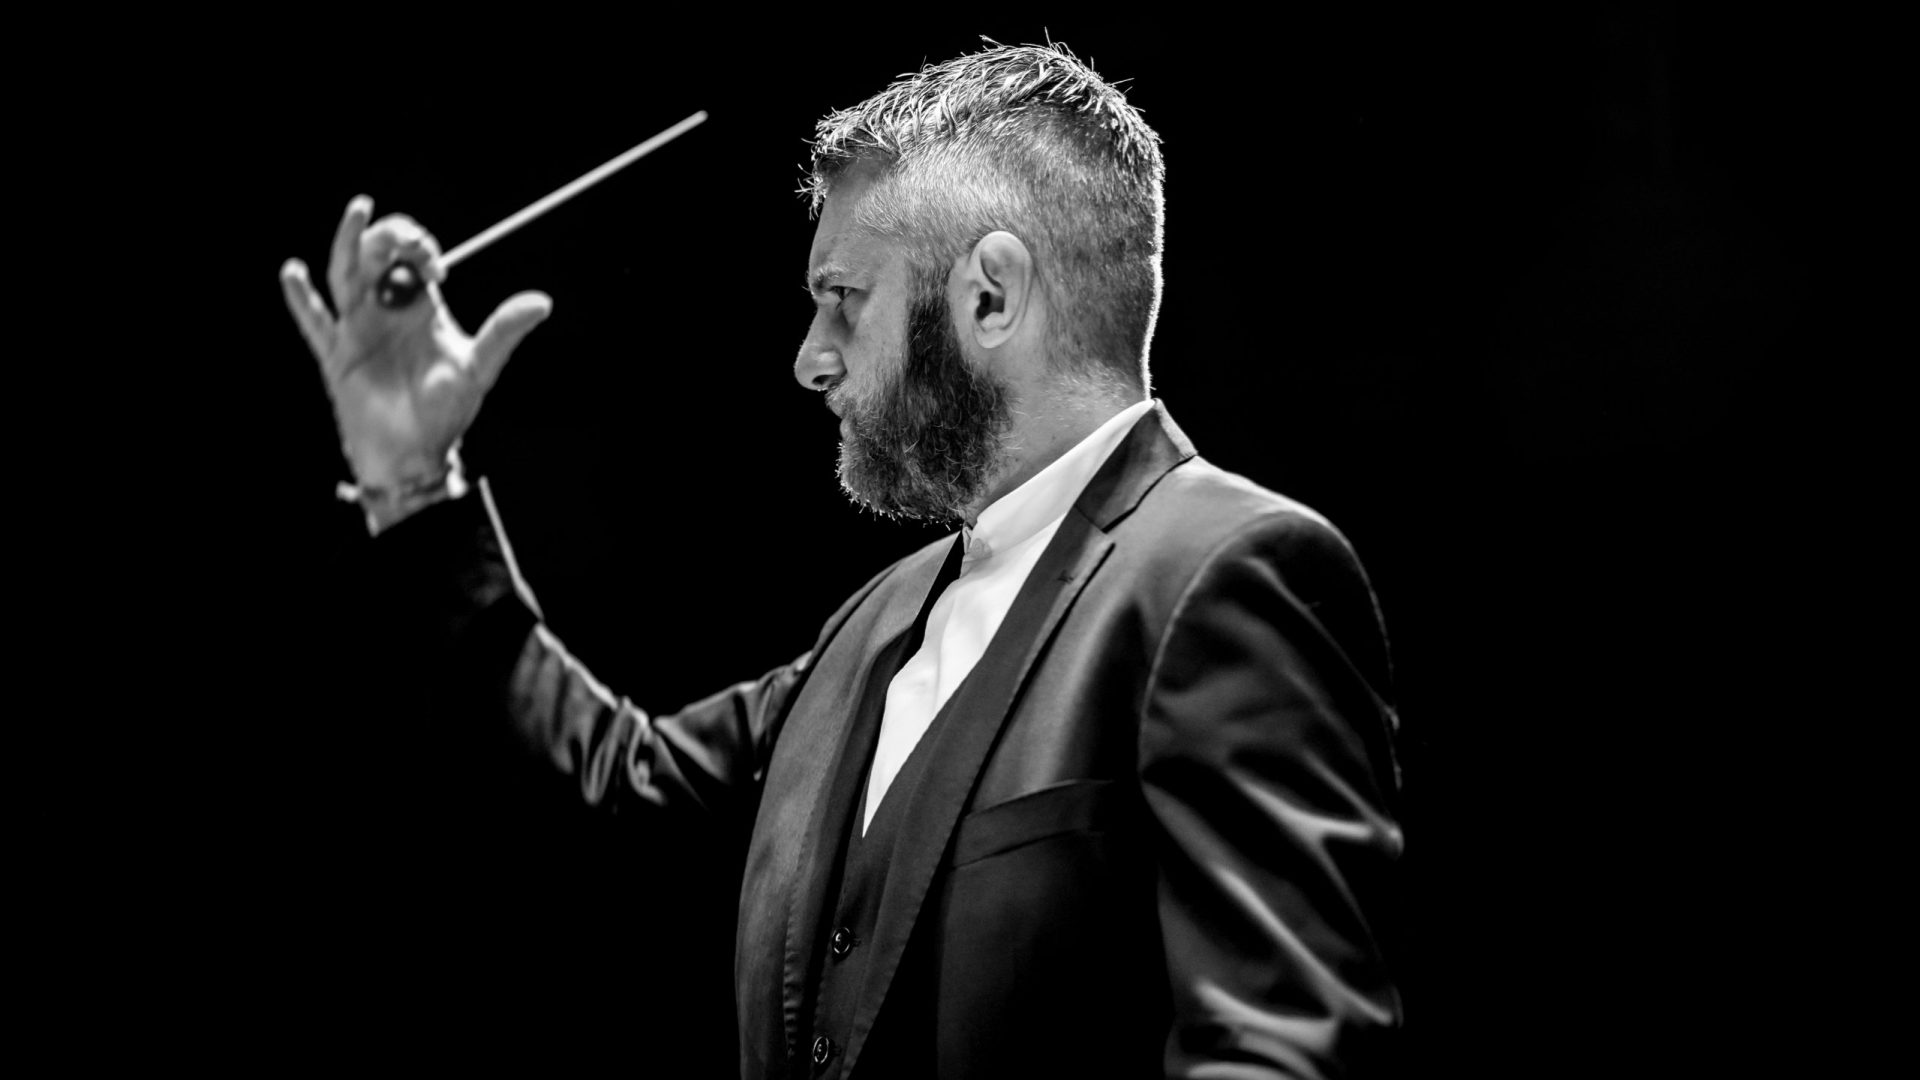 Conductor Kirill Karabits, Electrifying 2019/20 Season